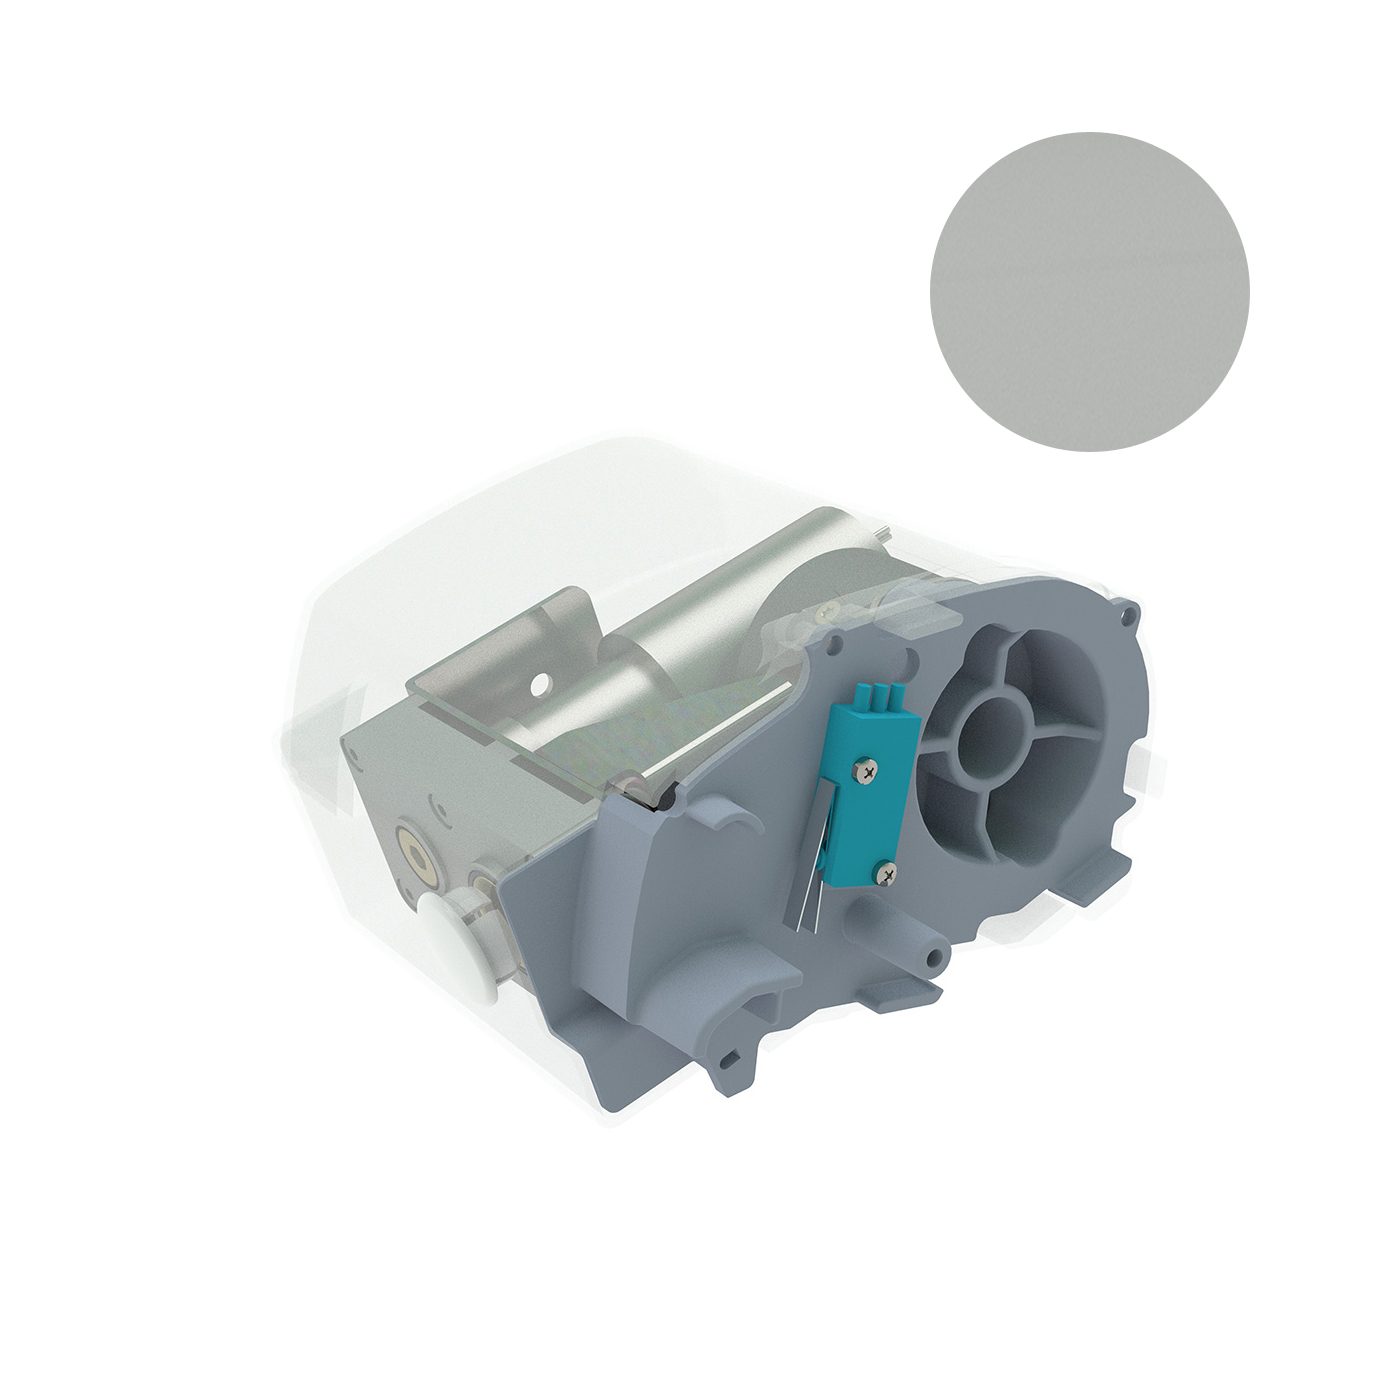 Fiamma Motor Kit Compact F80S 12V titanium